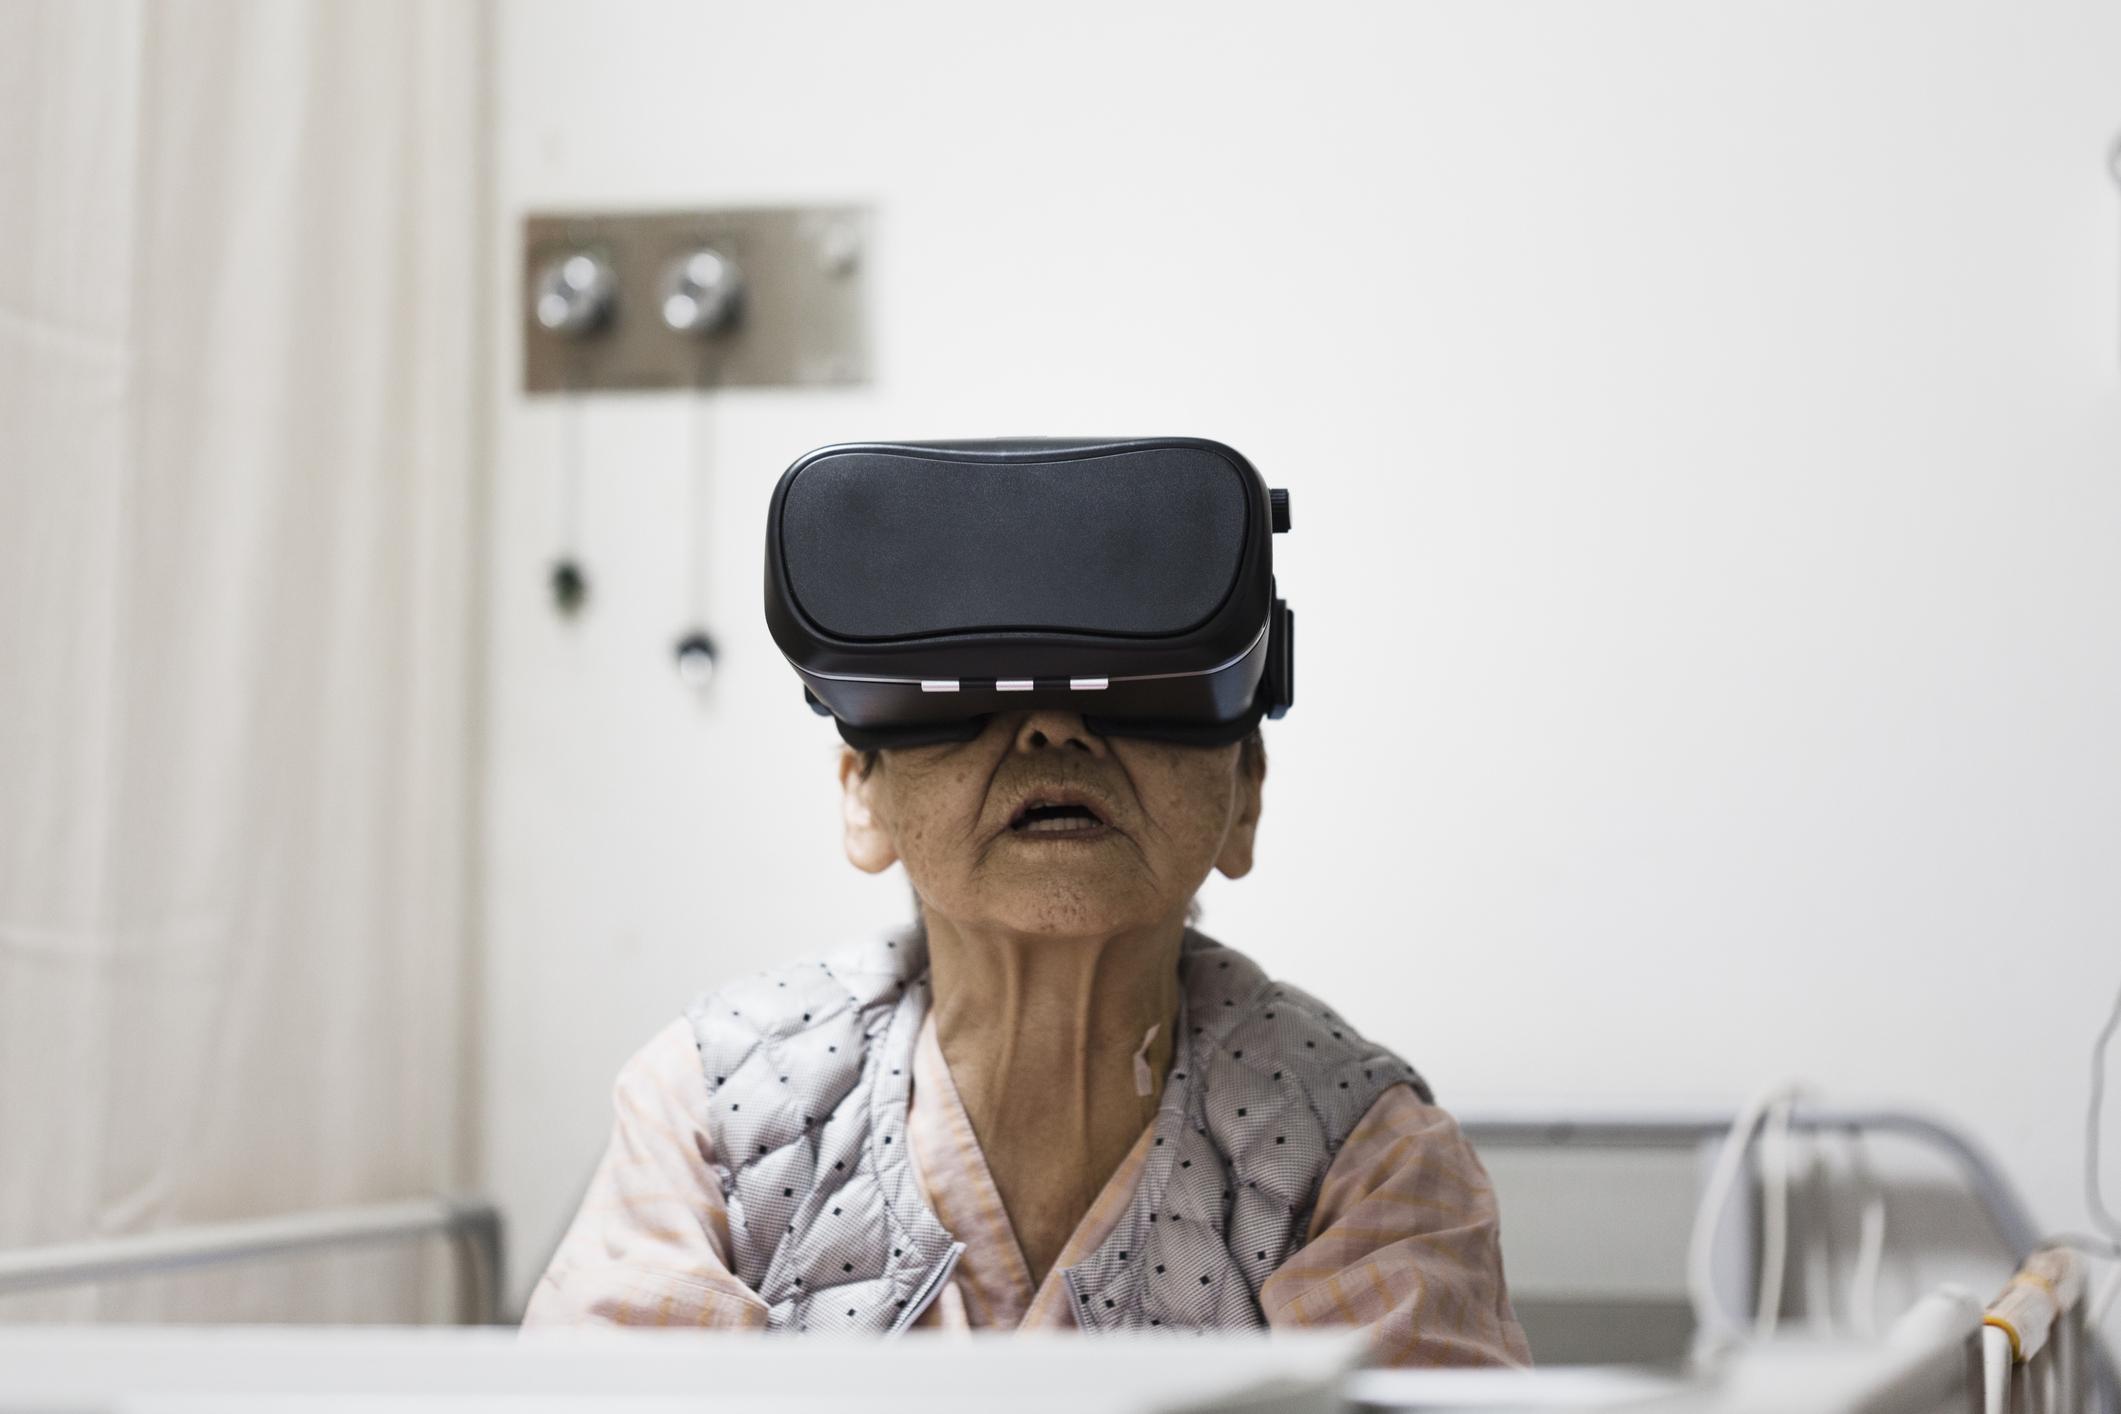 Is Nvidia Stock a Buy? - Motley Fool